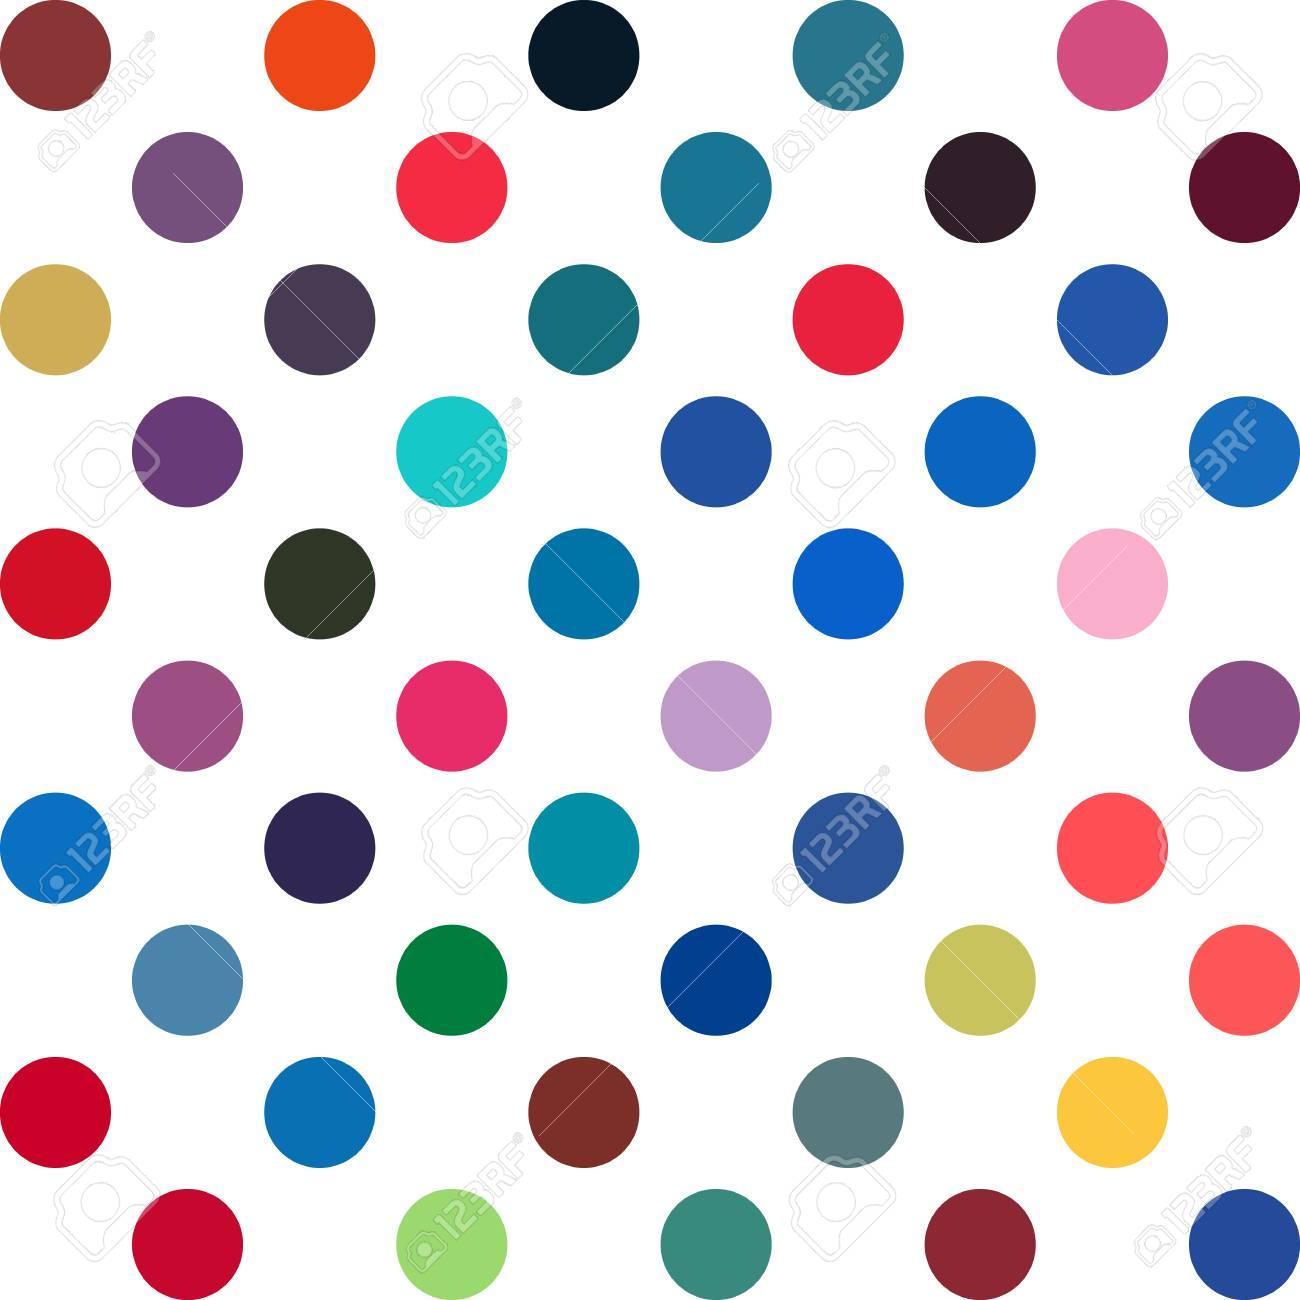 polka dot templates - Selo.l-ink.co